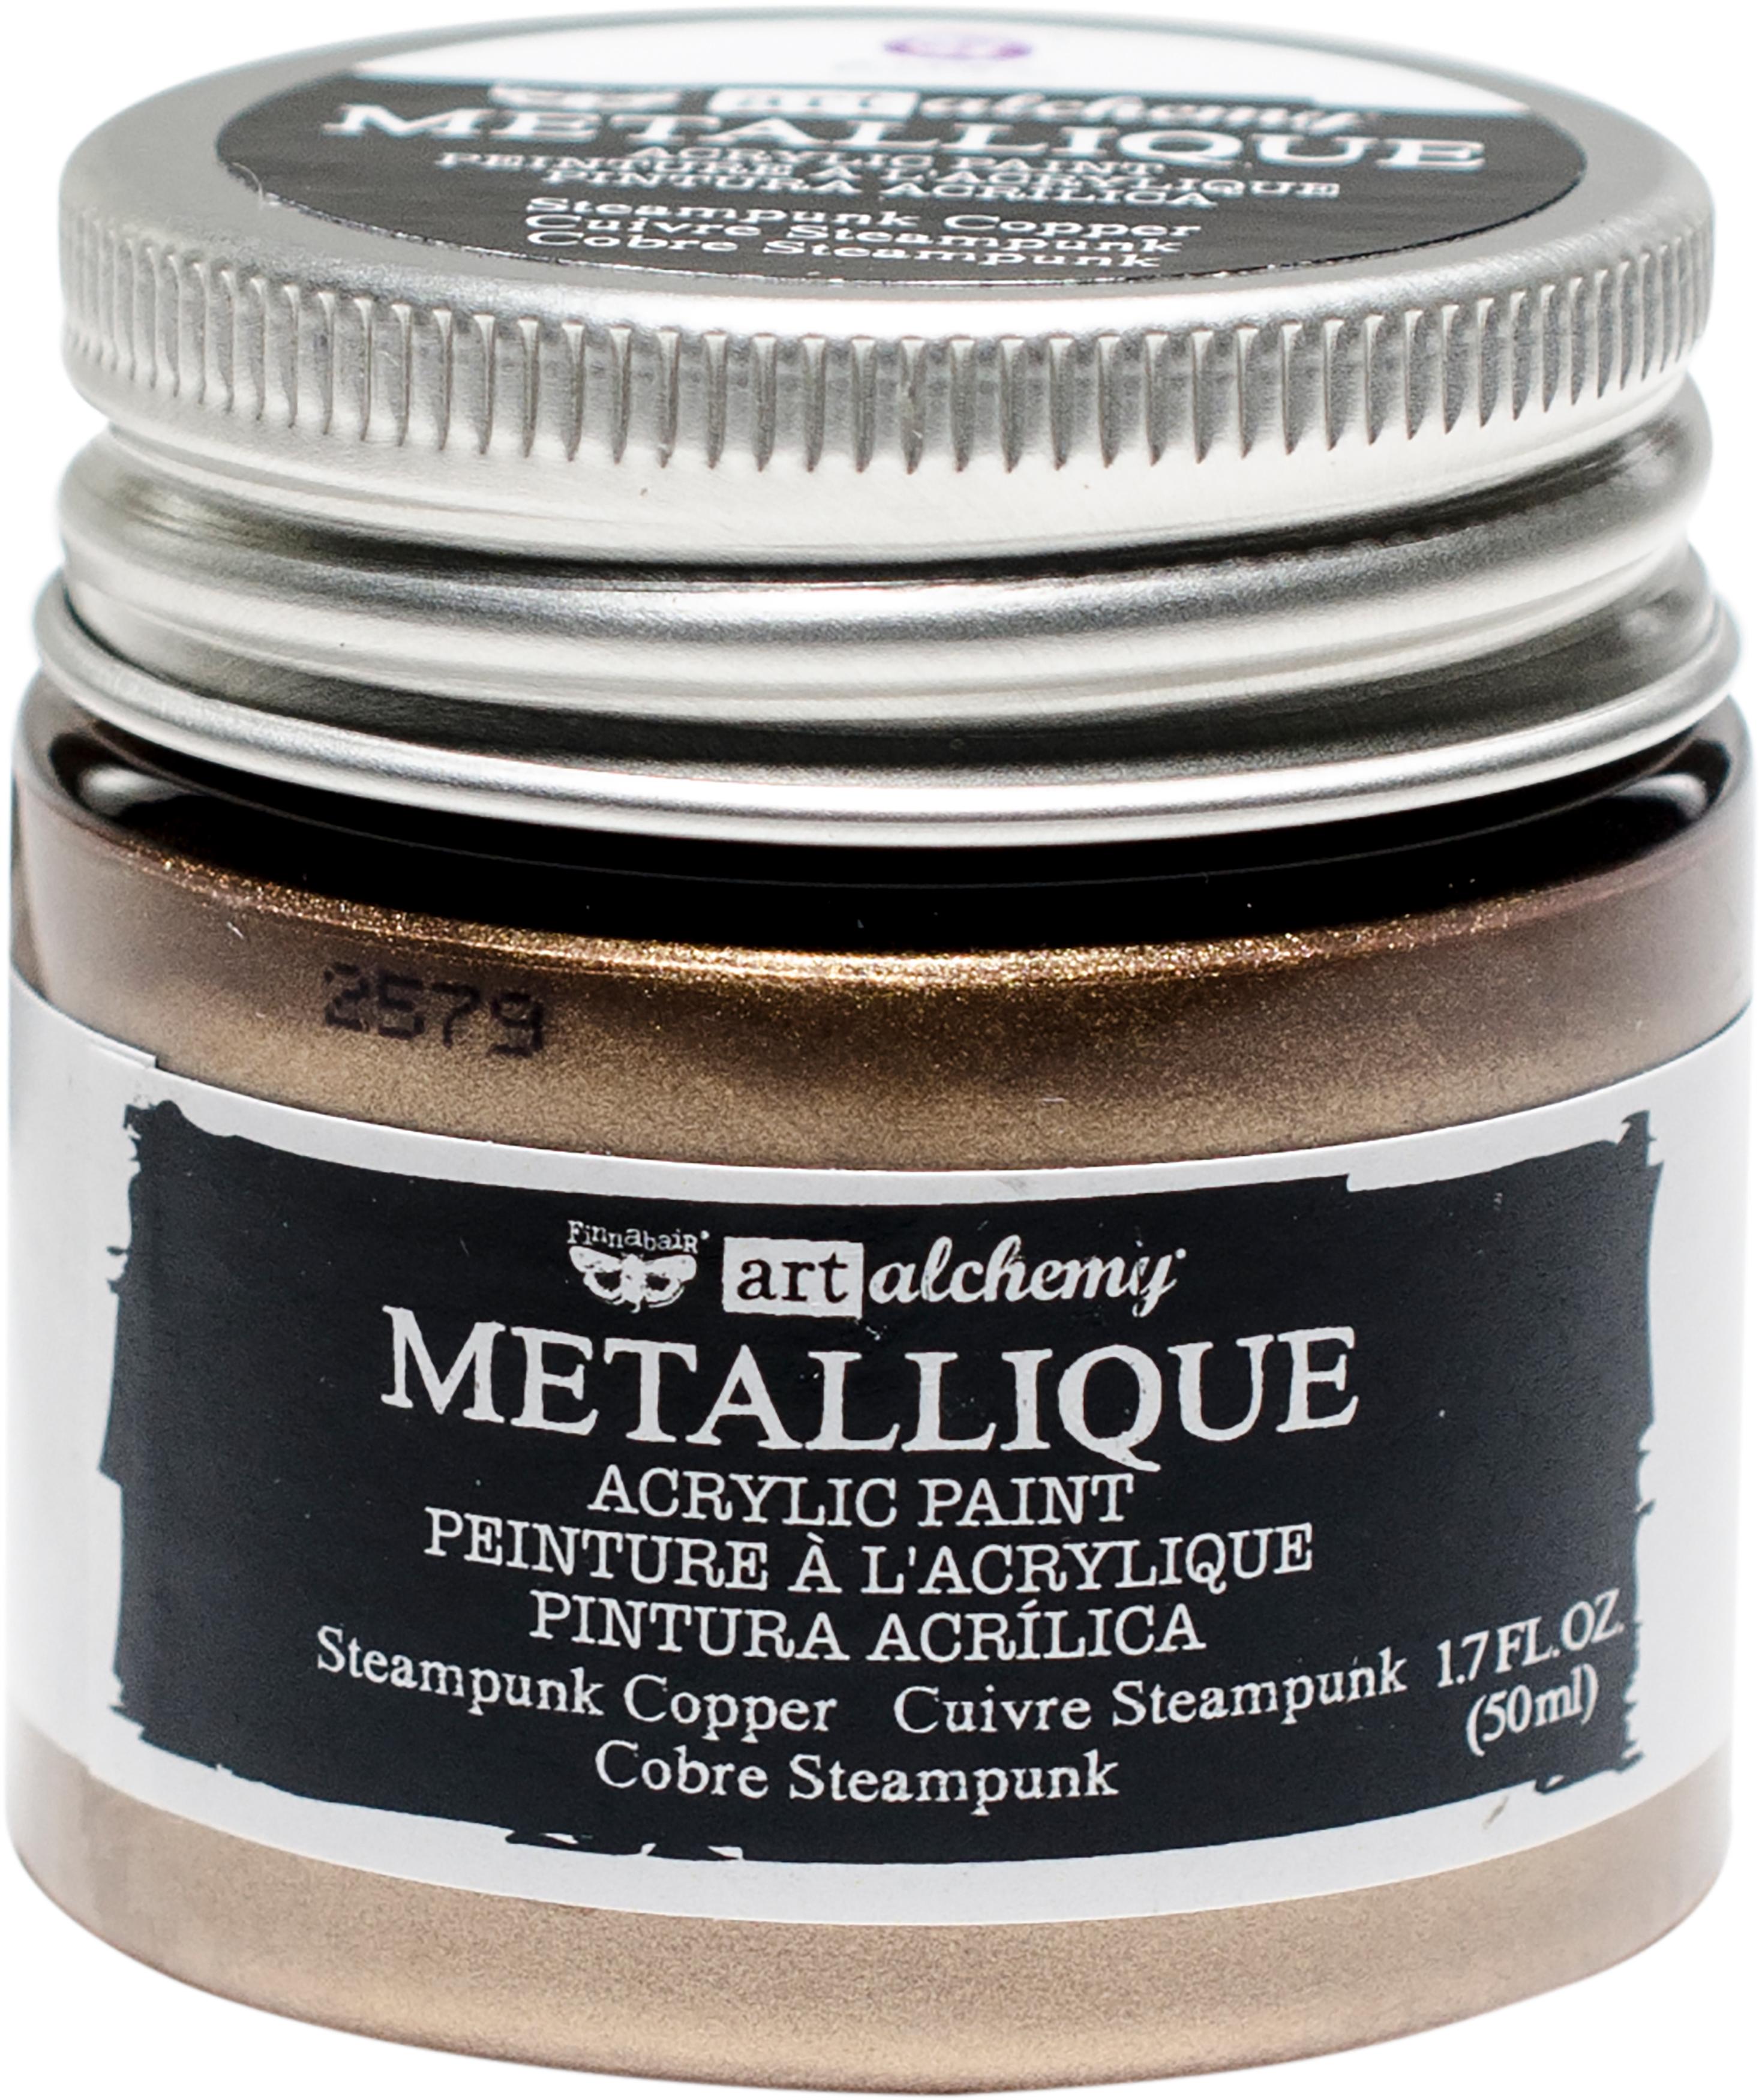 FB Metallique Steampunk Copper